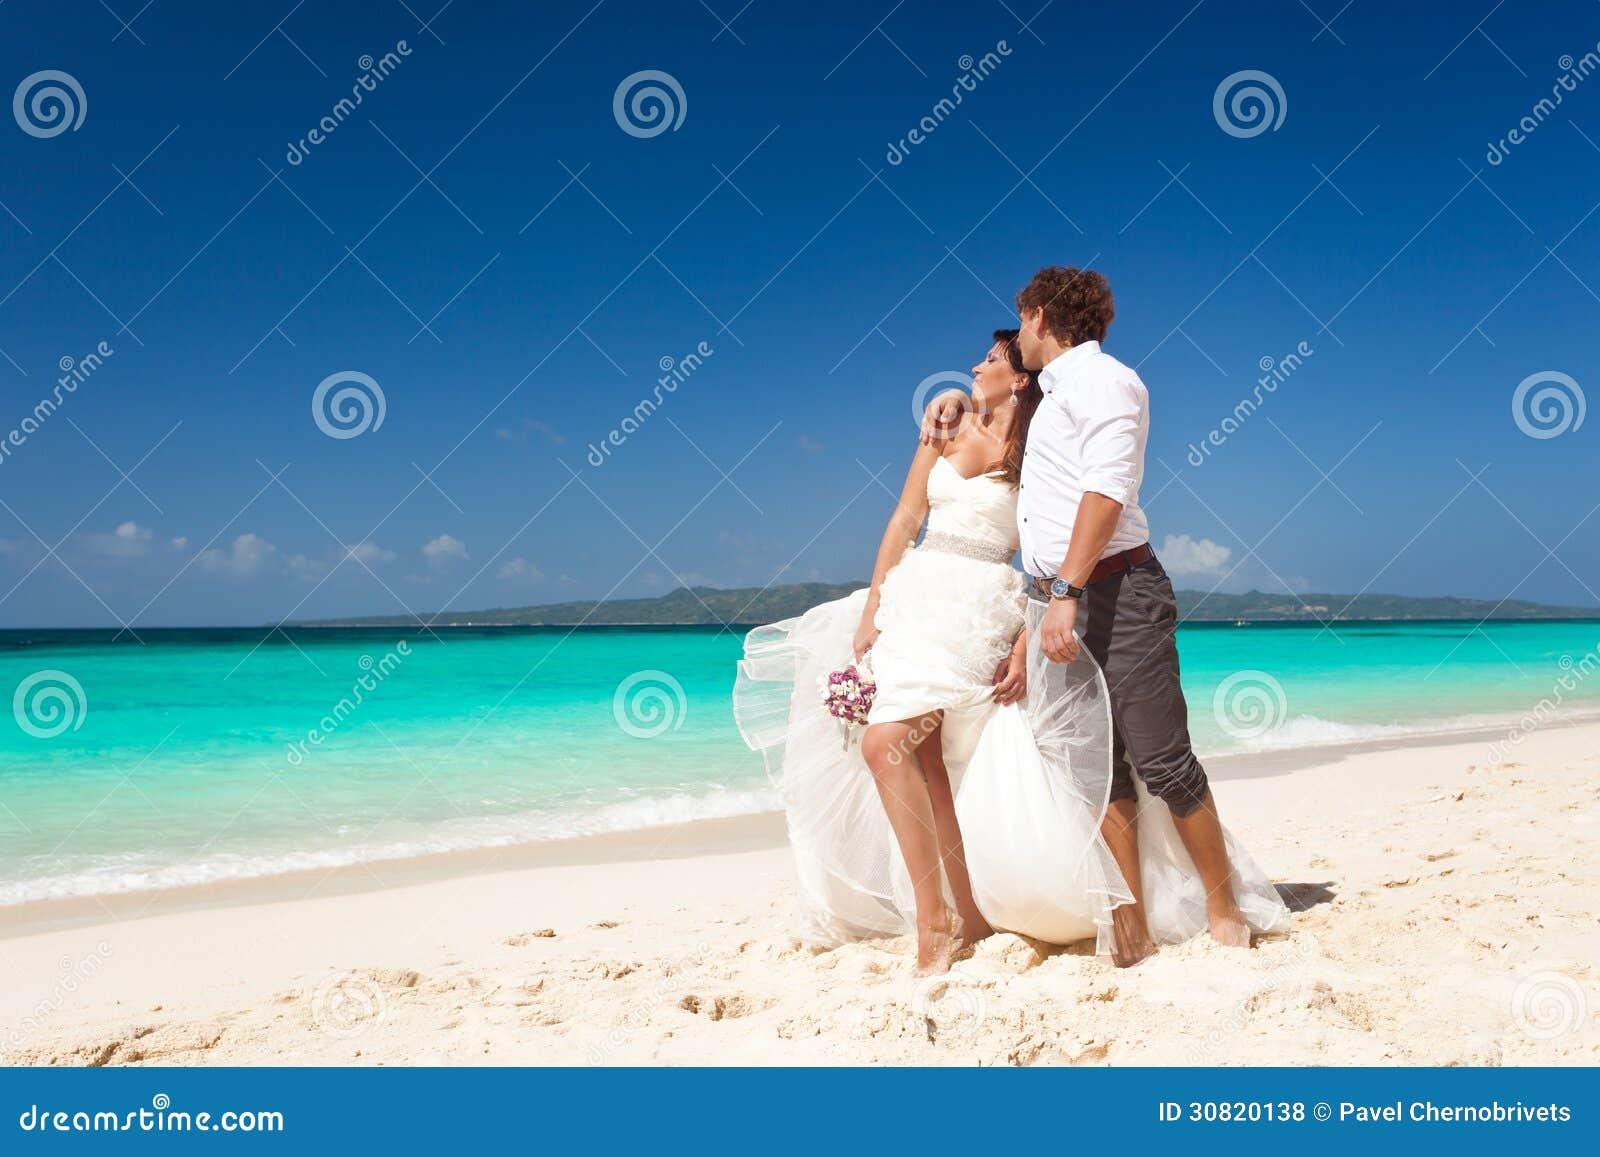 Bride And Groom Having Fun On Beach Royalty Free Stock Photos